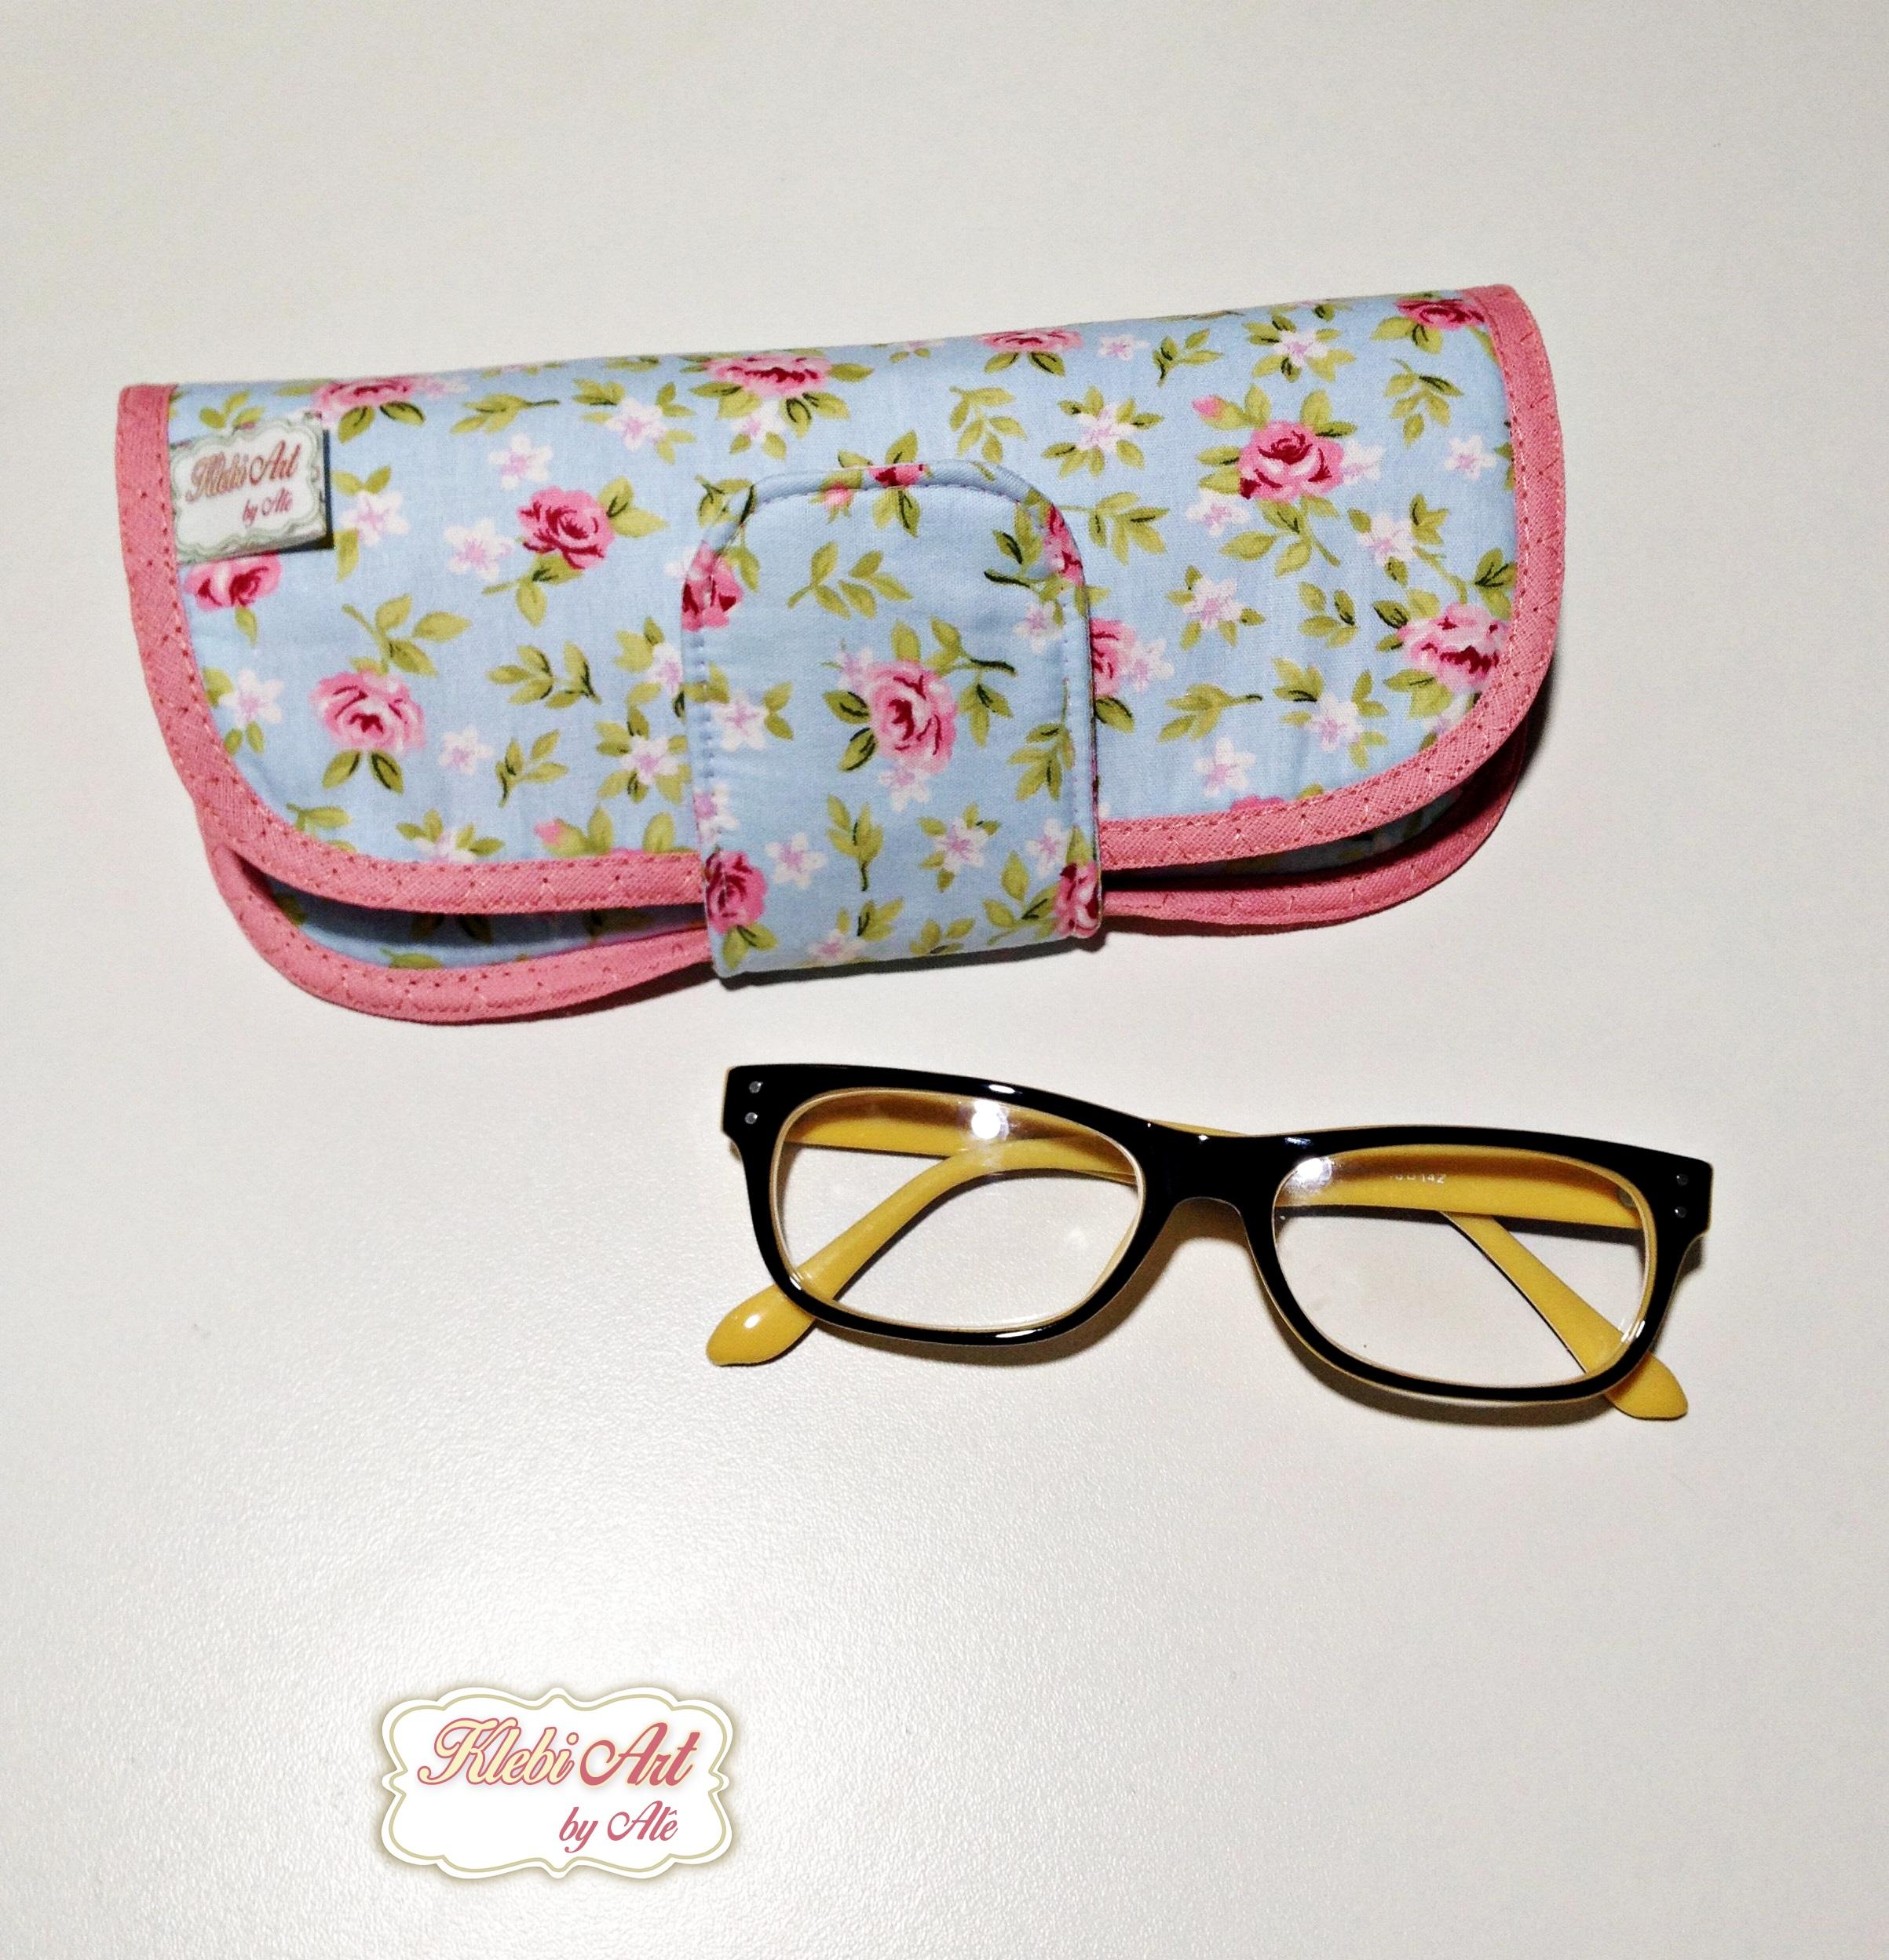 5a9050585 Porta Oculos e Porta Relogio | Elo7